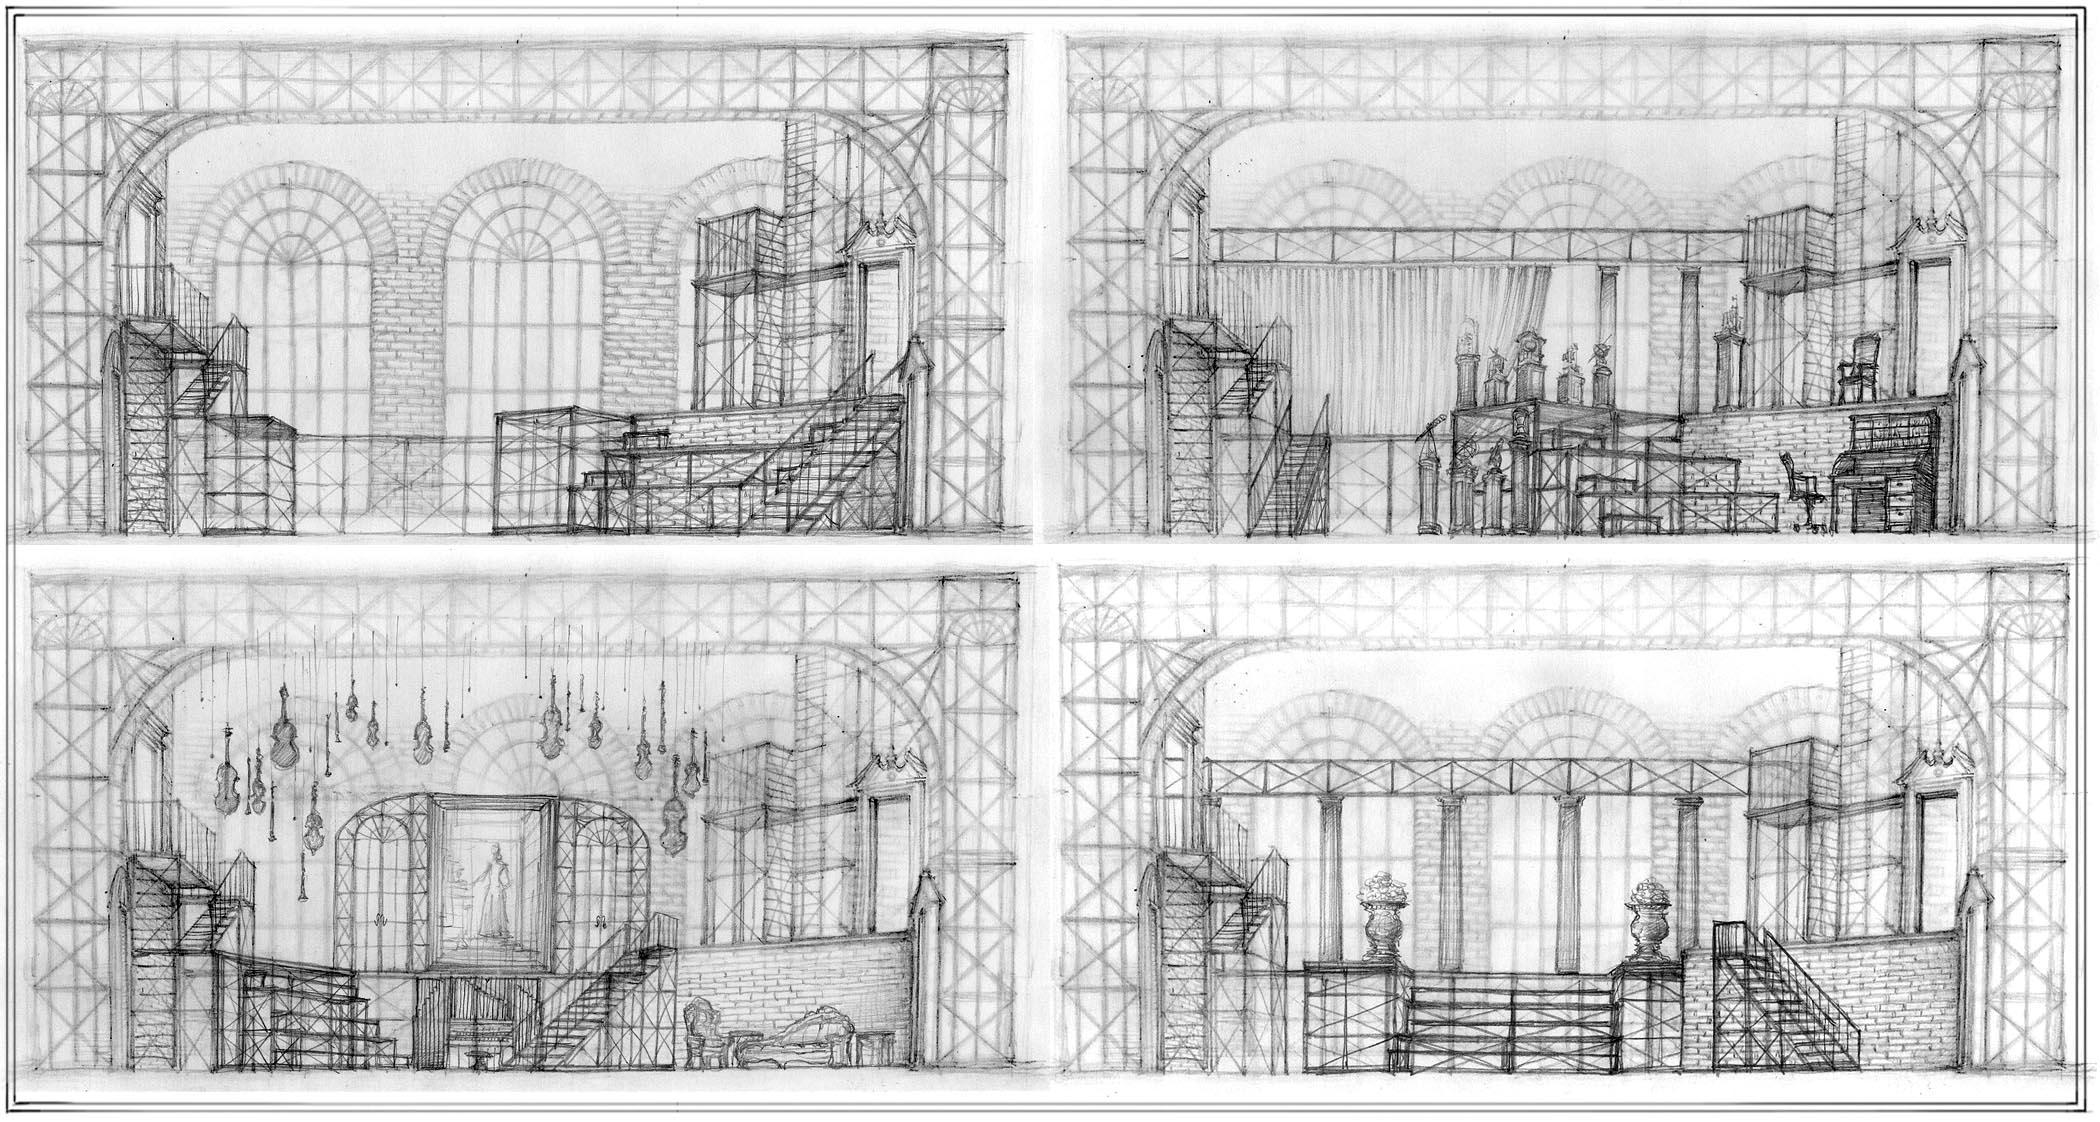 Hoffman-Final Sketches